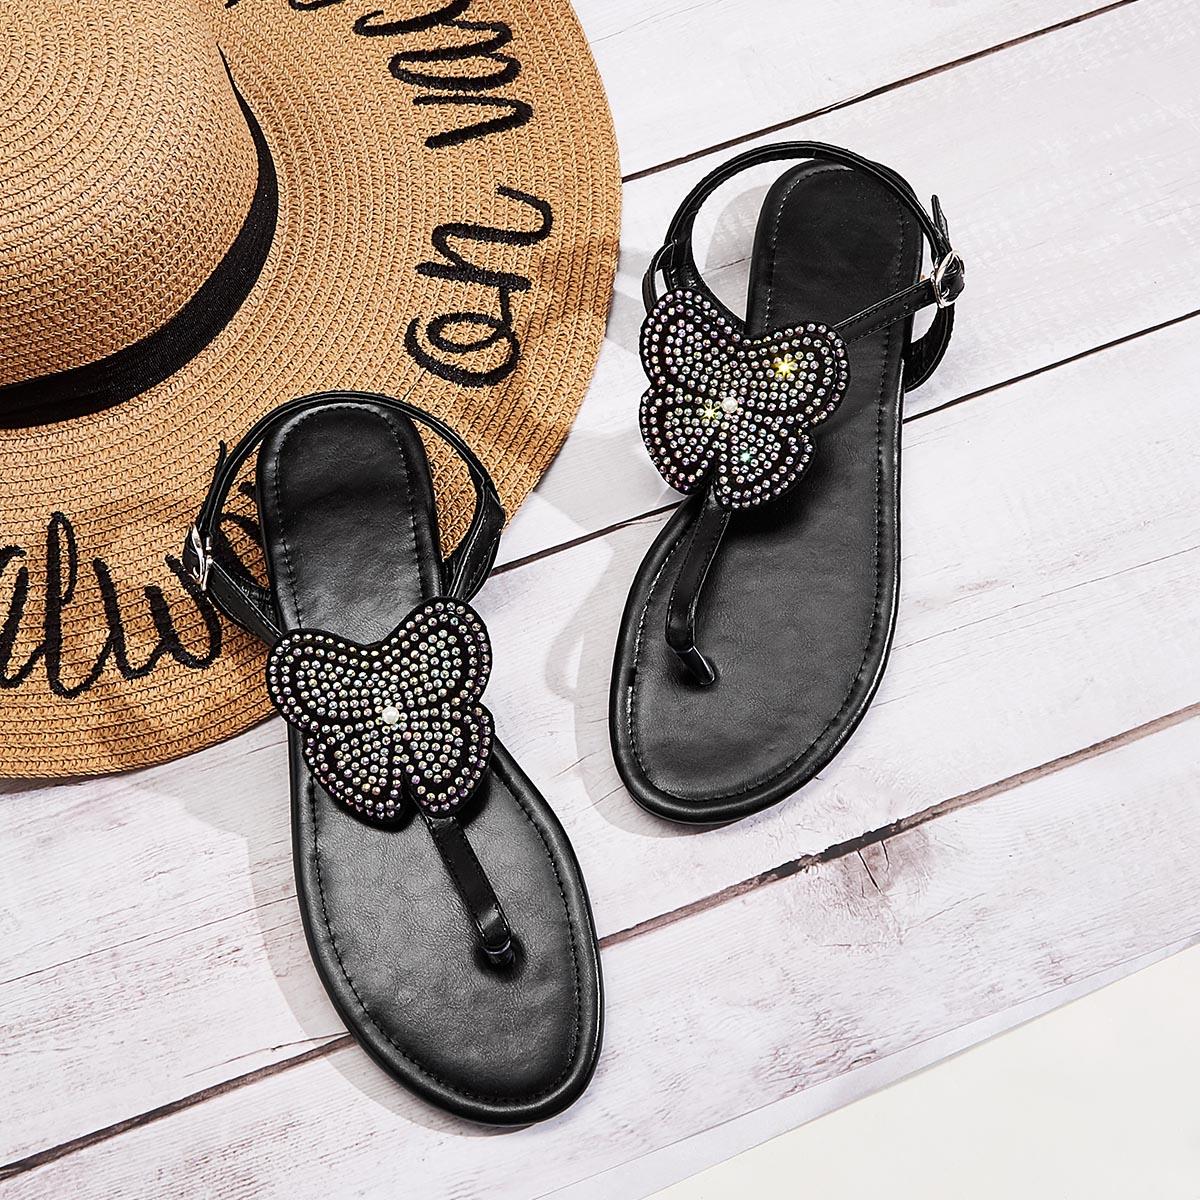 SHEIN / Rhinestone Decor Toe Post Ankle Strap Sandals